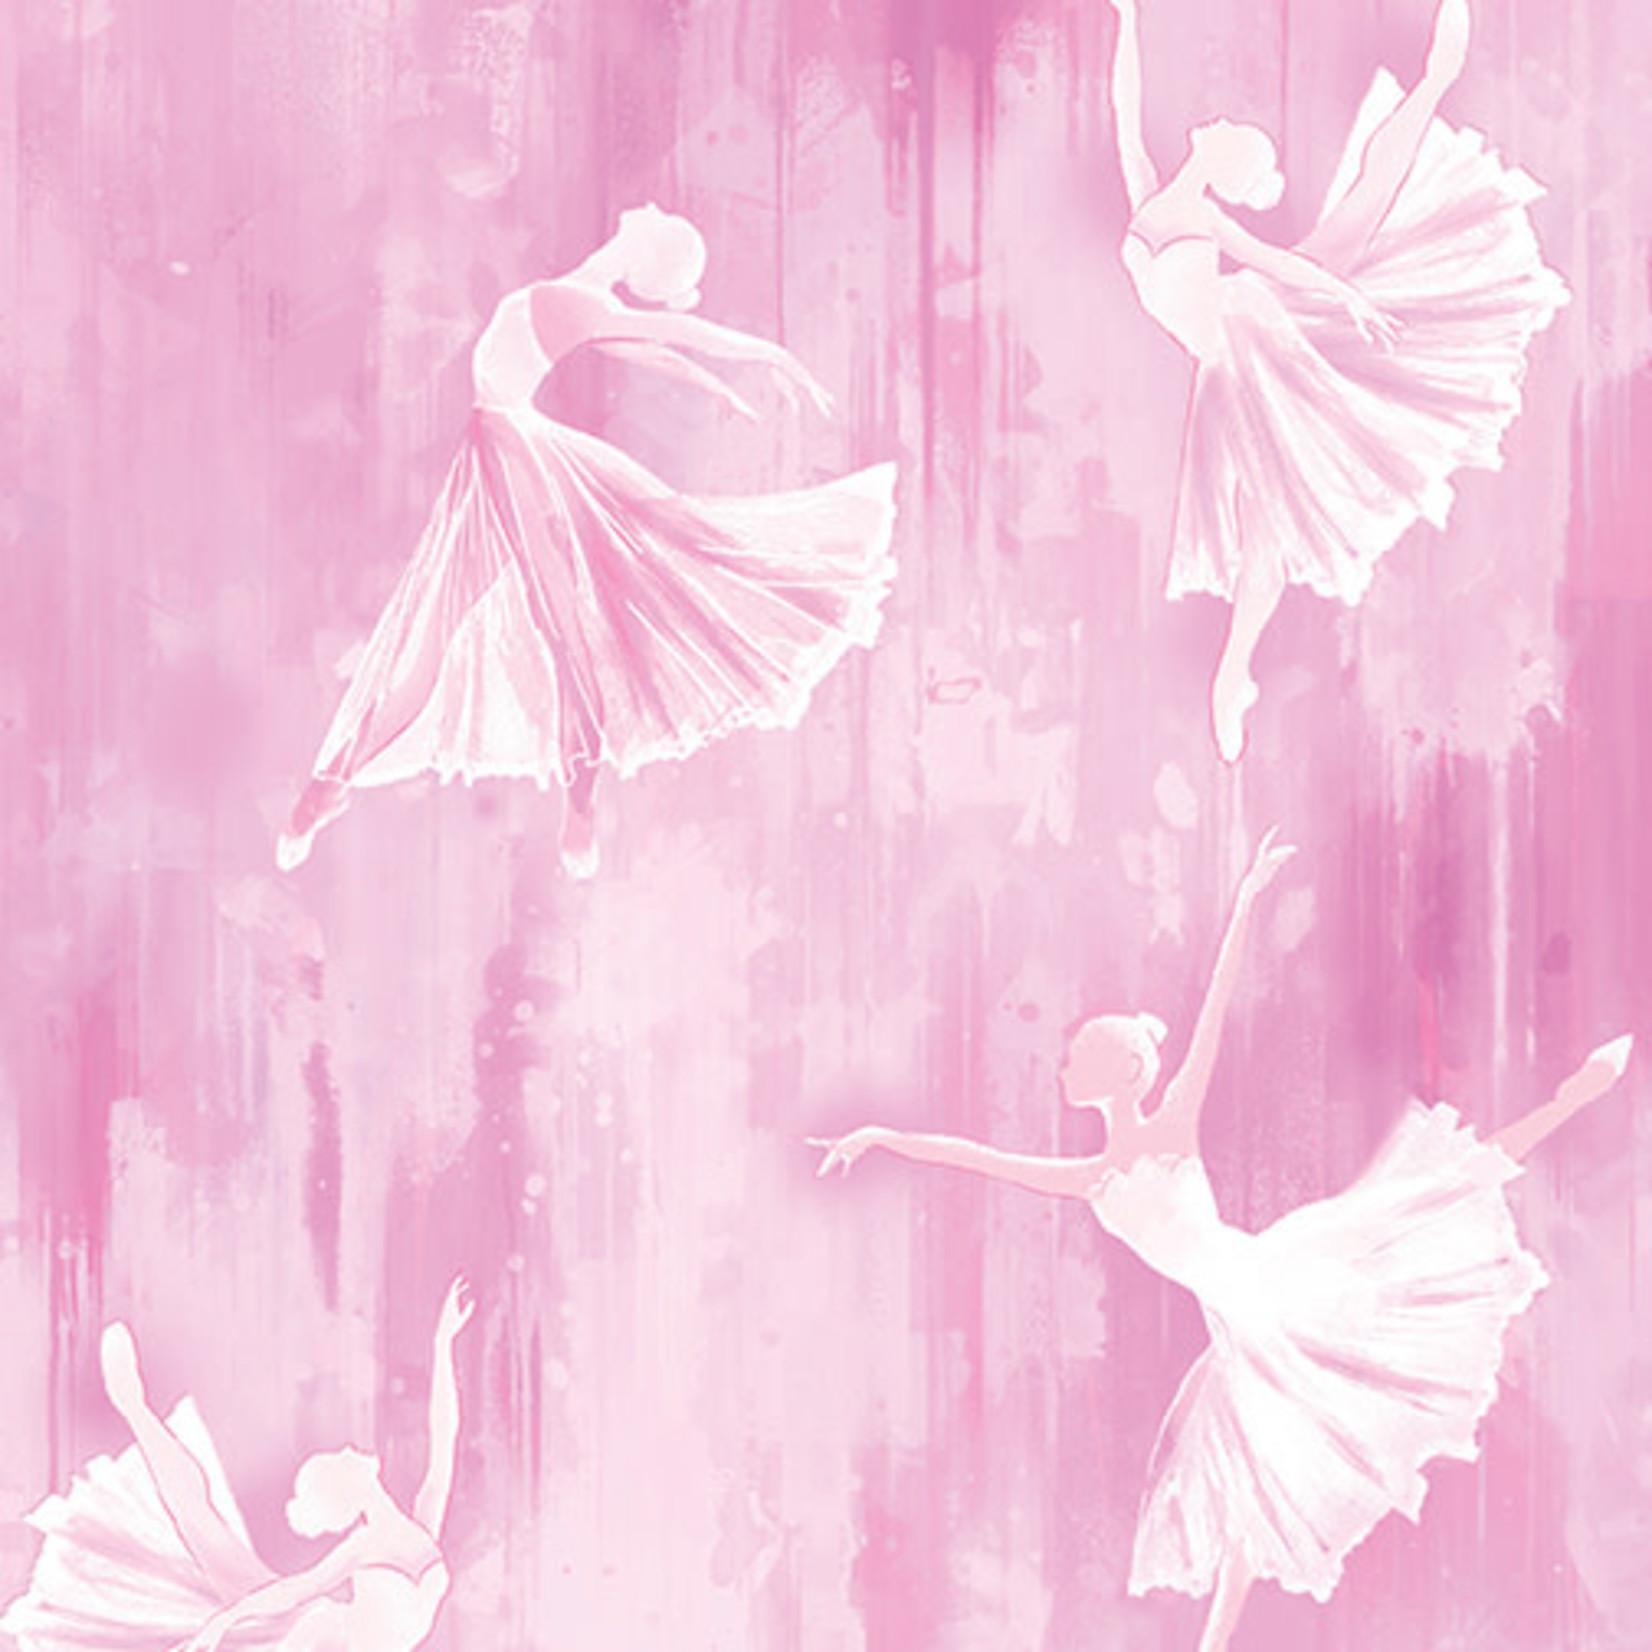 Contempo Studios Ballerina - Silhouette - Pink